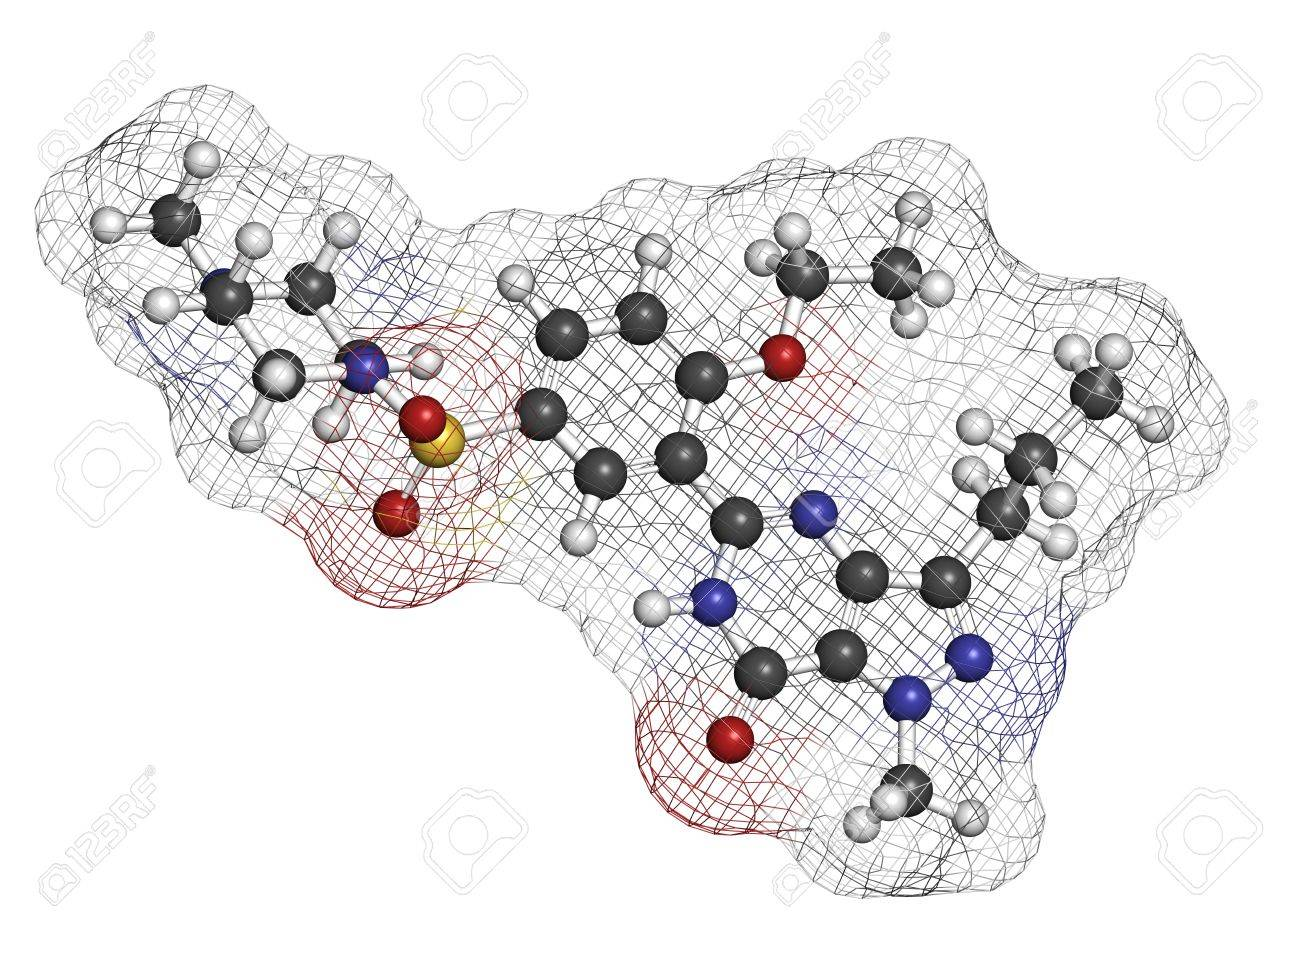 remedios para la disfunción eréctil sildenafila